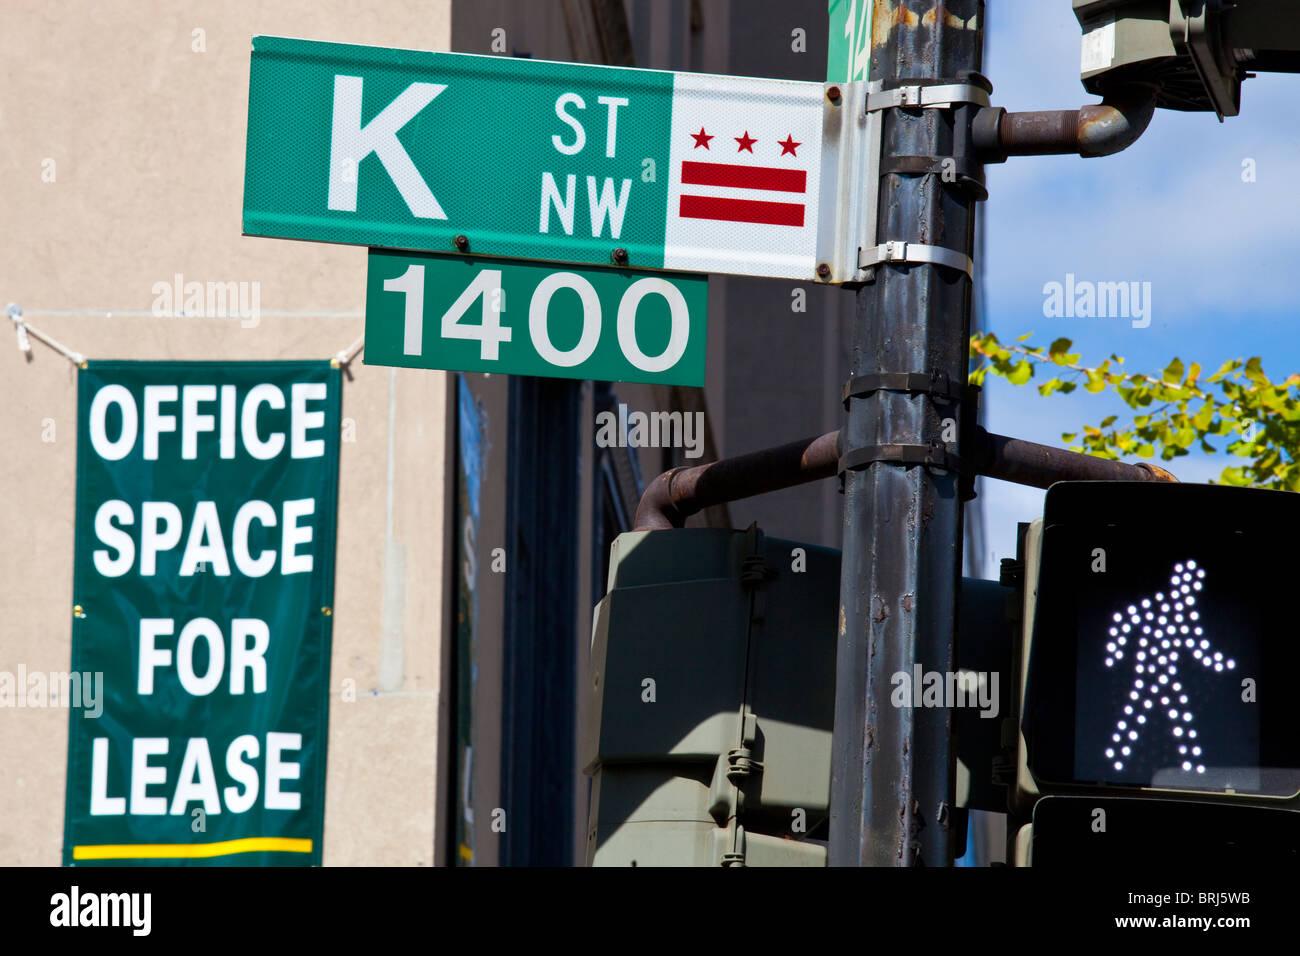 K Street, Washington DC - Stock Image